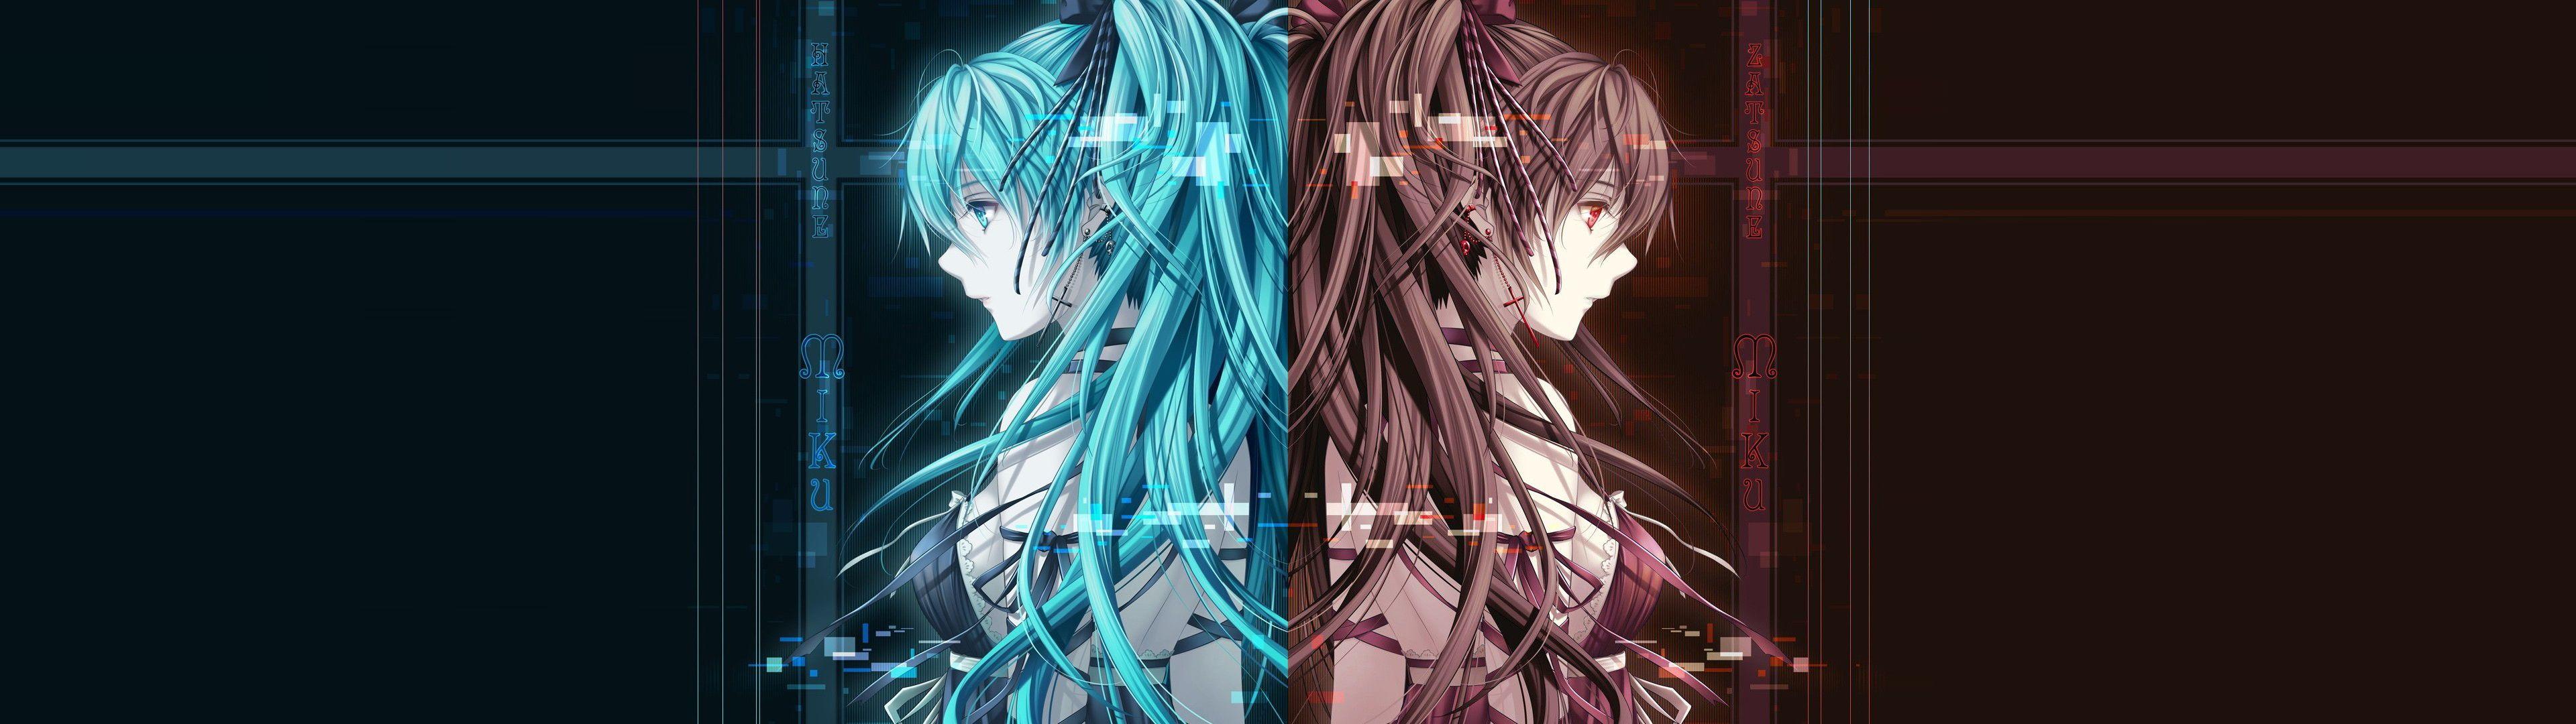 Anime Wallpaper 3840x1080 Wallpapersafari Character Wallpaper Dual Monitor Wallpaper 3840x1080 Wallpaper